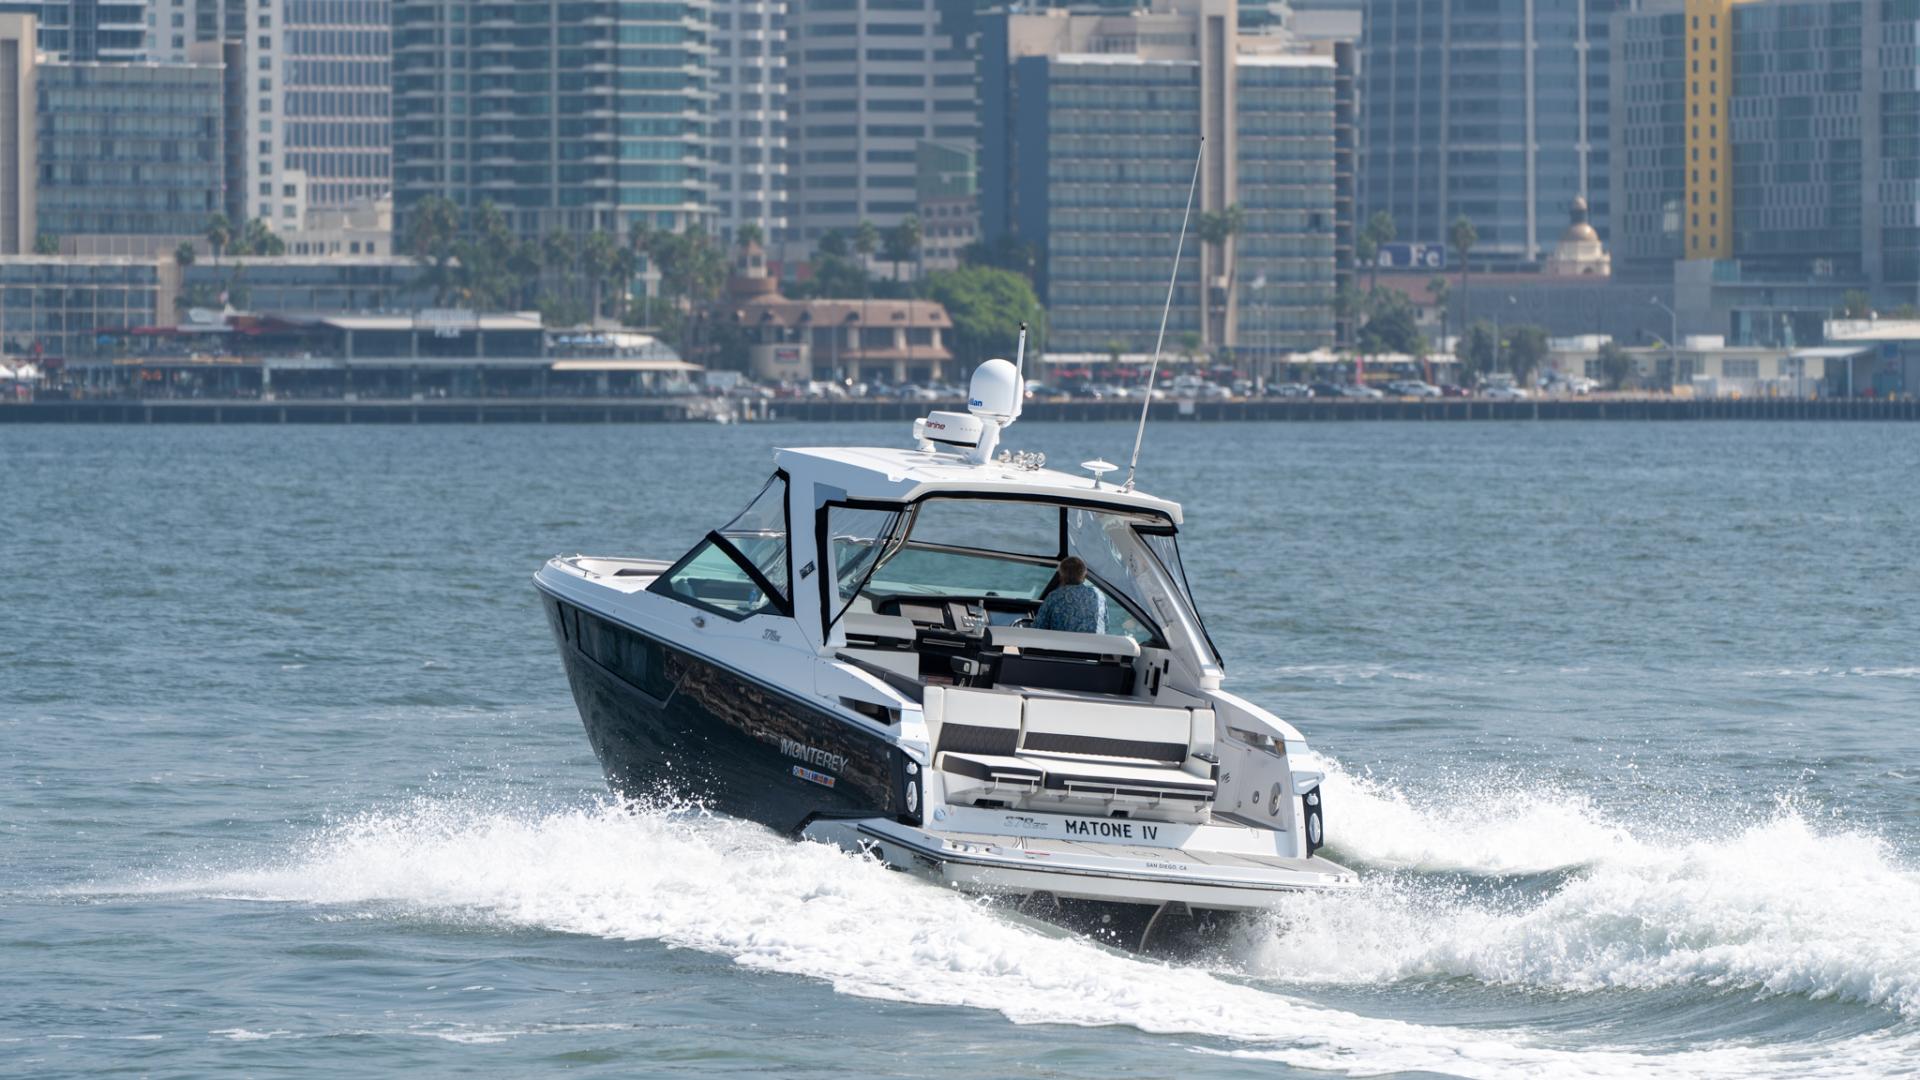 Monterey-378SE 2019-MATONE IV California-United States-EXTERIOR-1511158   Thumbnail